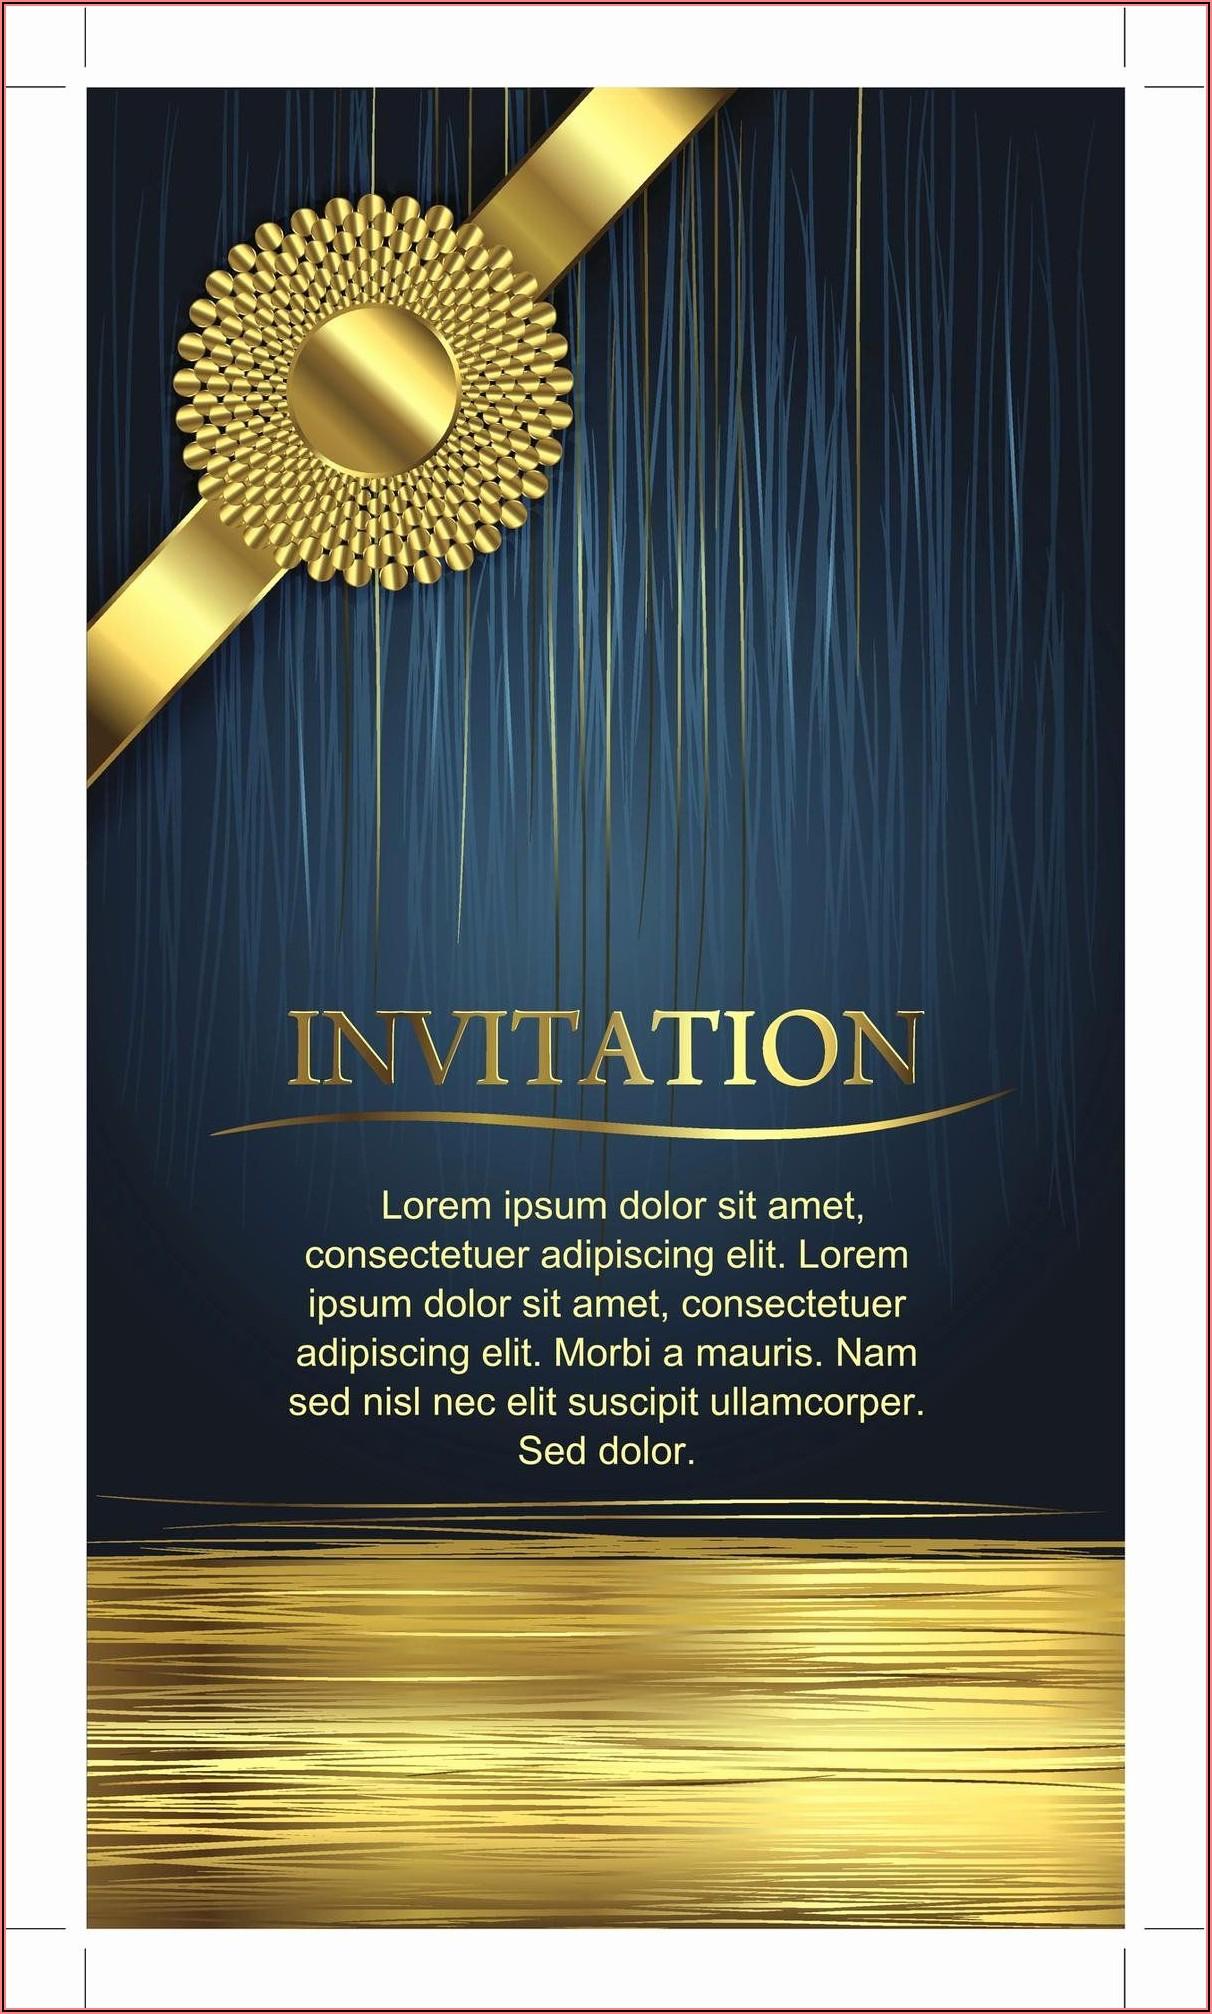 50th Birthday Invitation Wording Samples